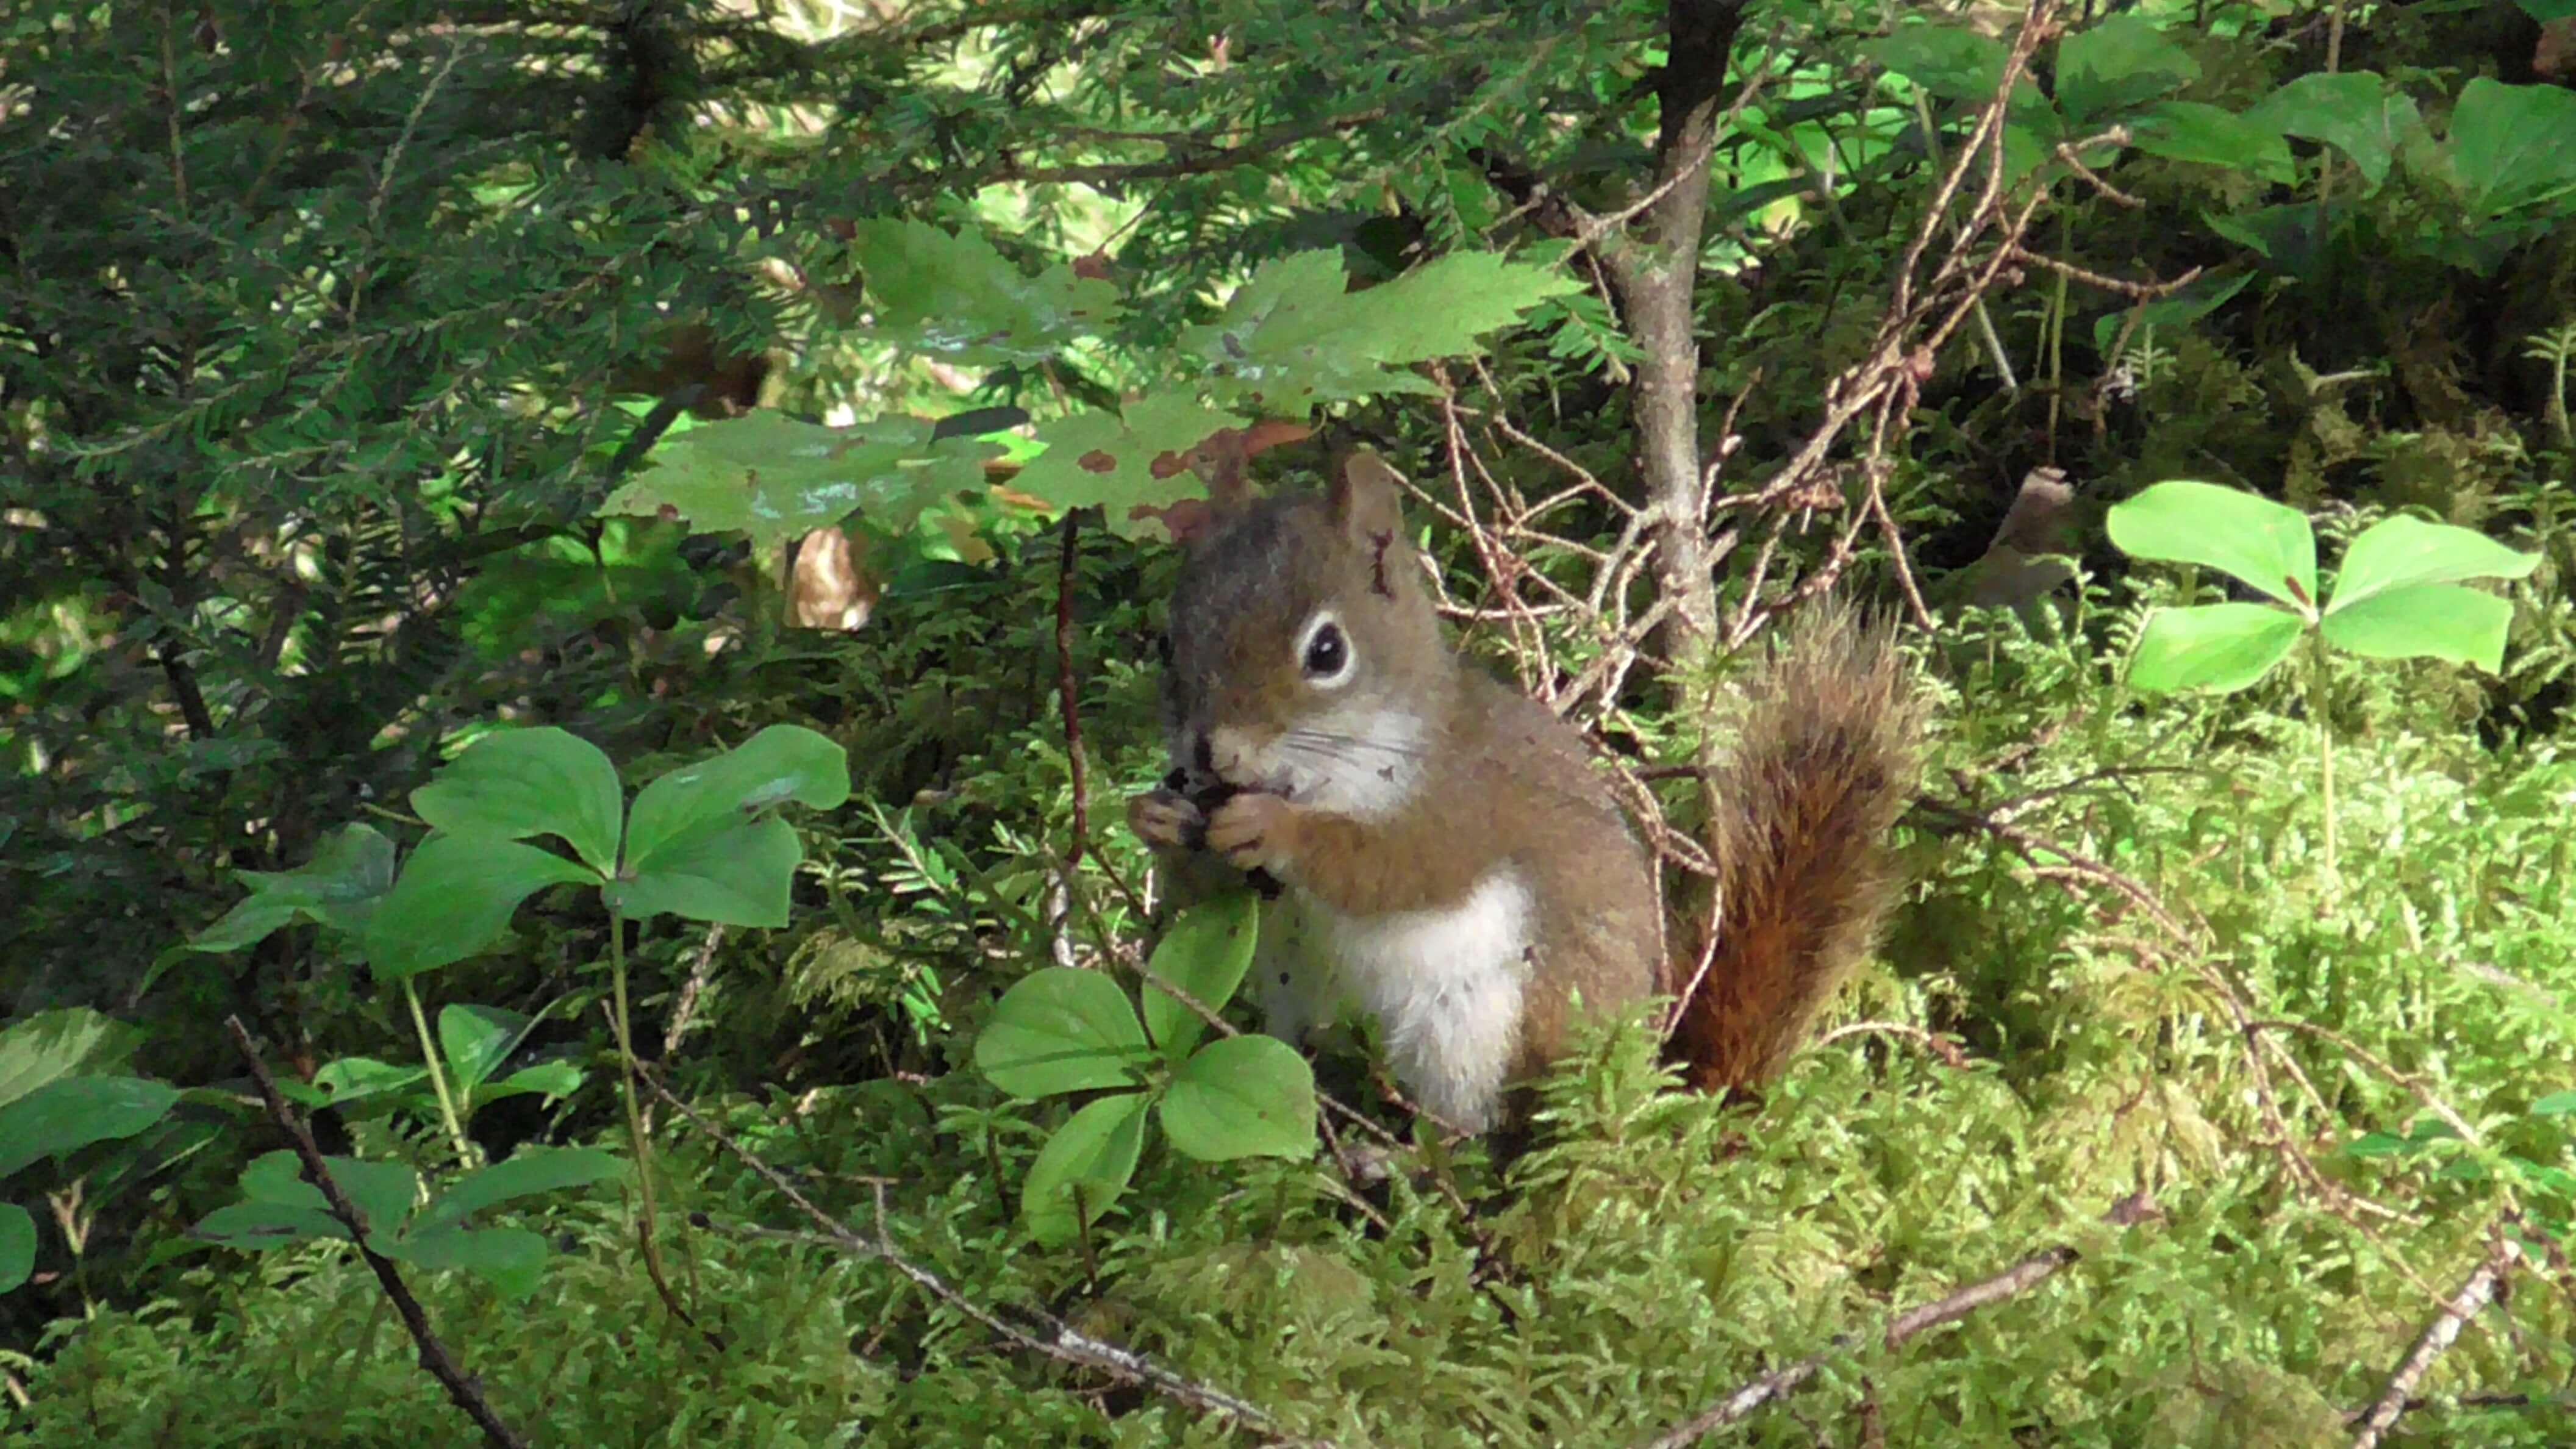 Red Squirrel, Old Growth Hemlock Forest, Kejimkujik National Park, Nova Scotia